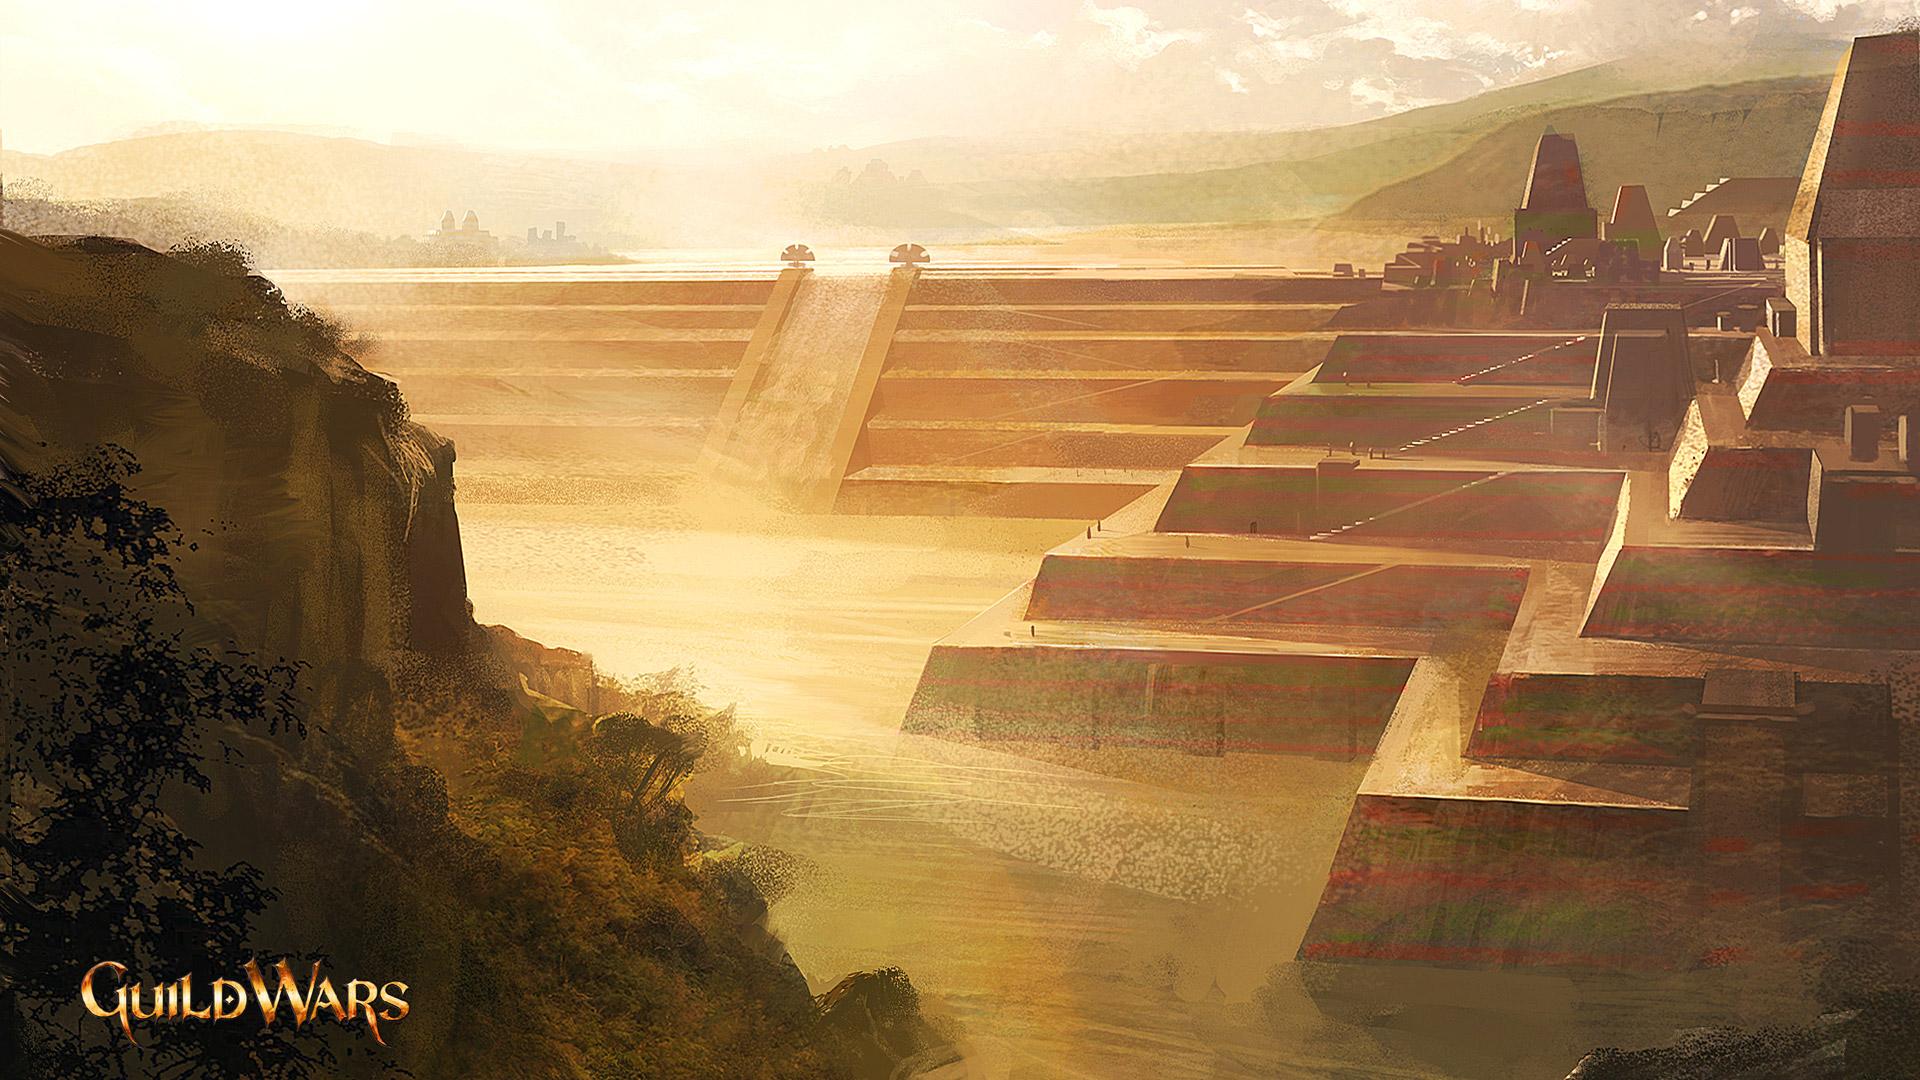 Guild Wars wallpaper 1